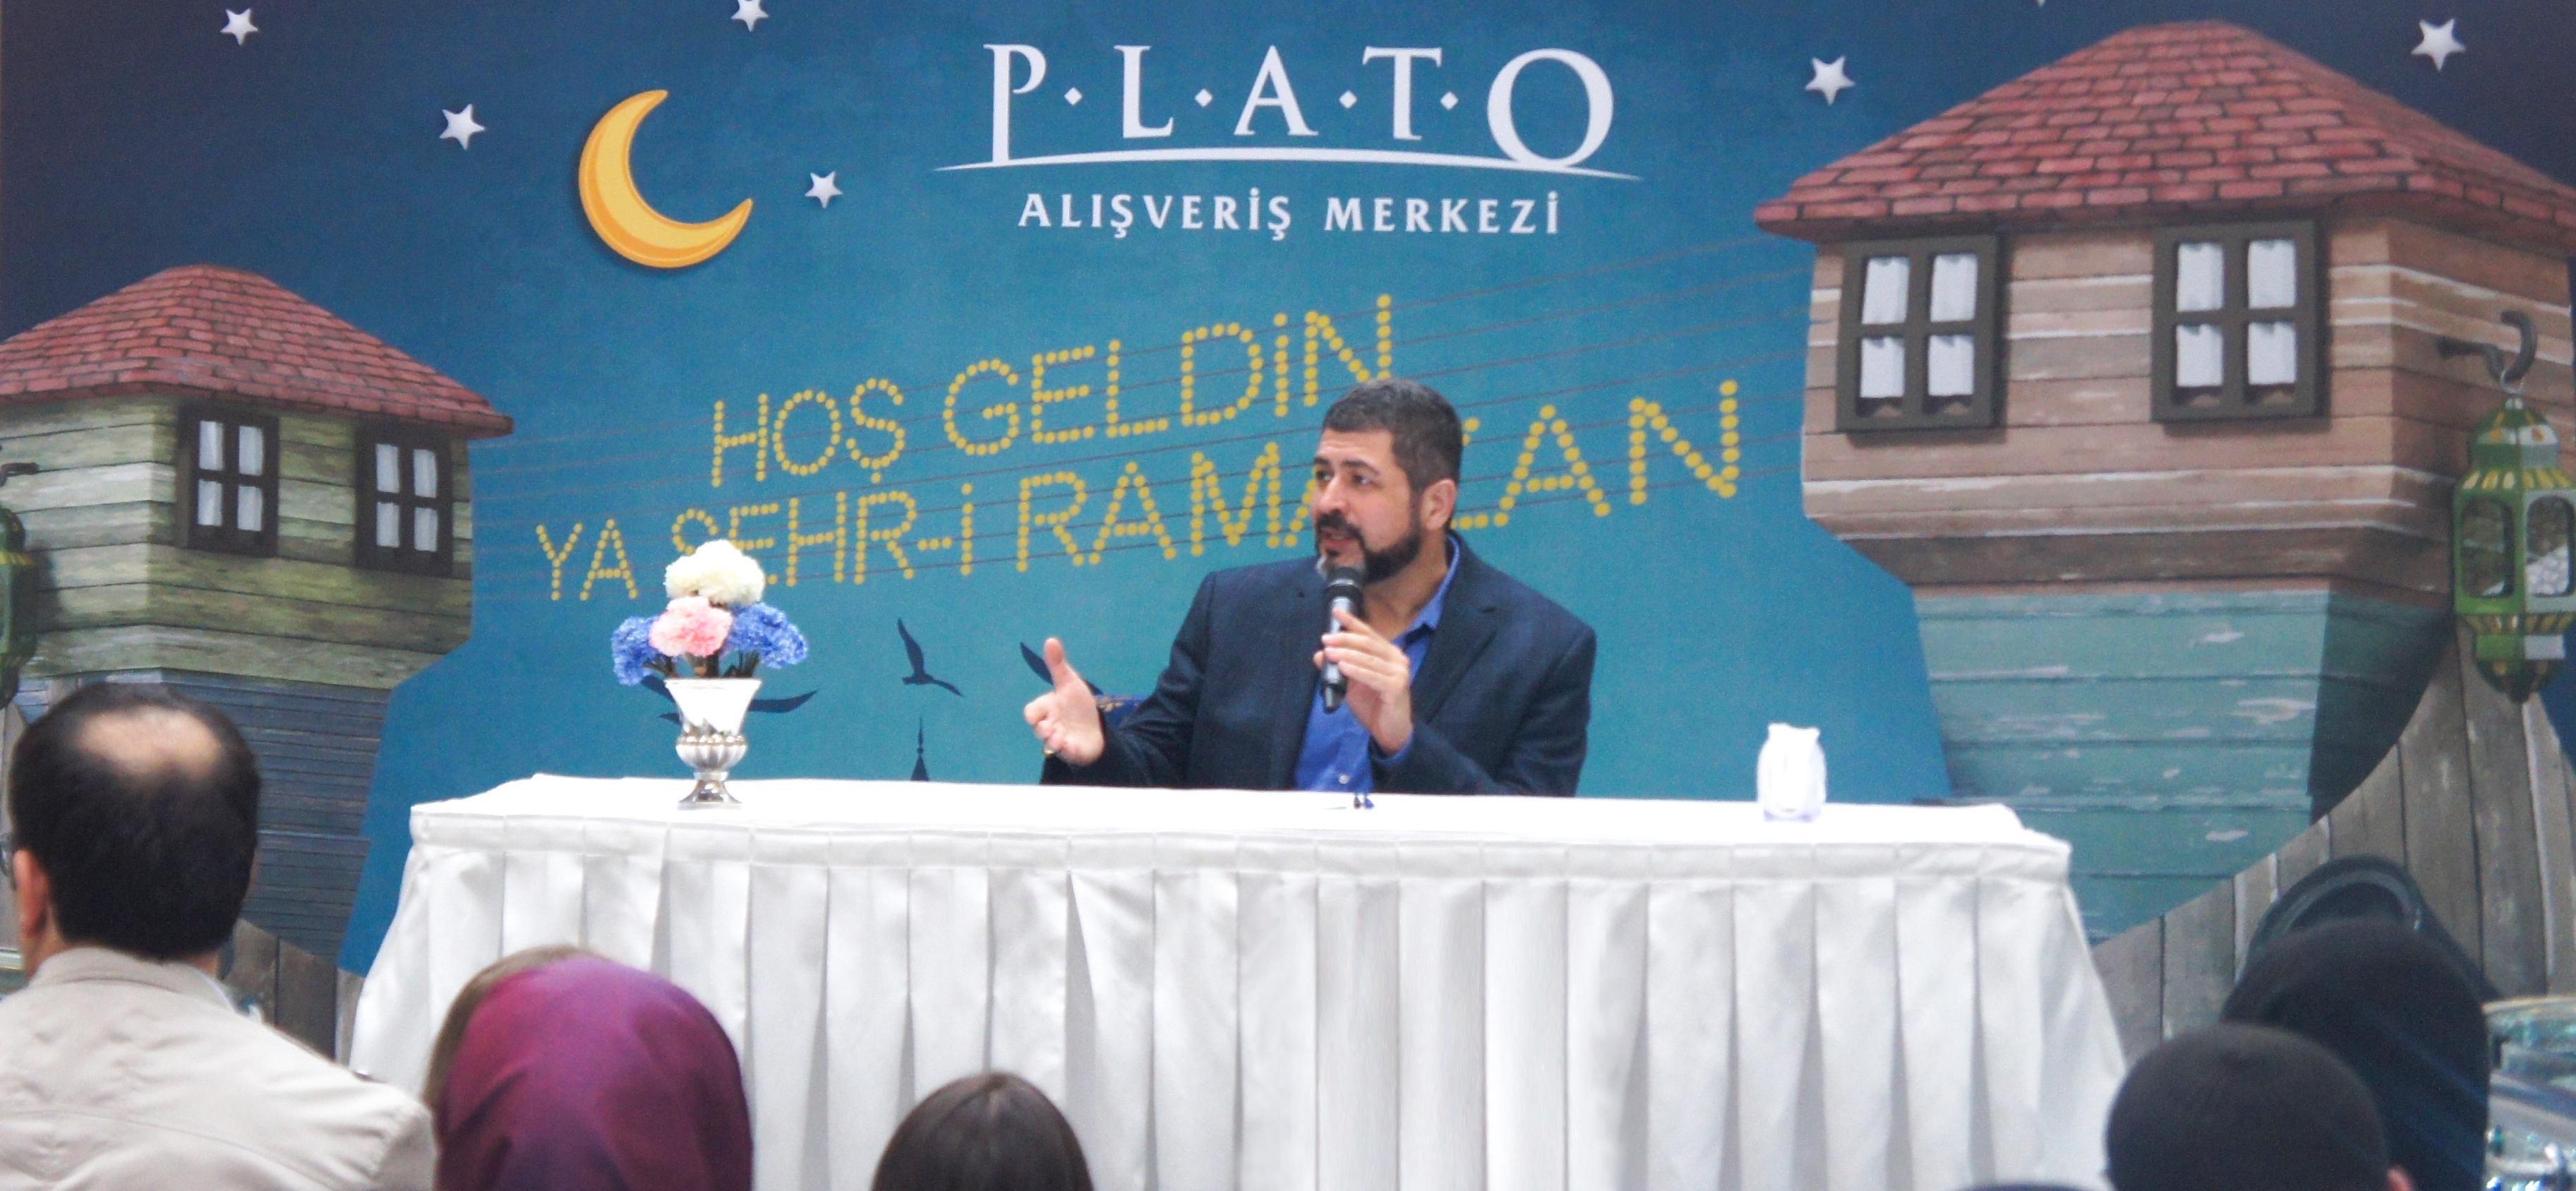 M. Fatih ÇITLAK Plato AVM'ye konuk oldu.